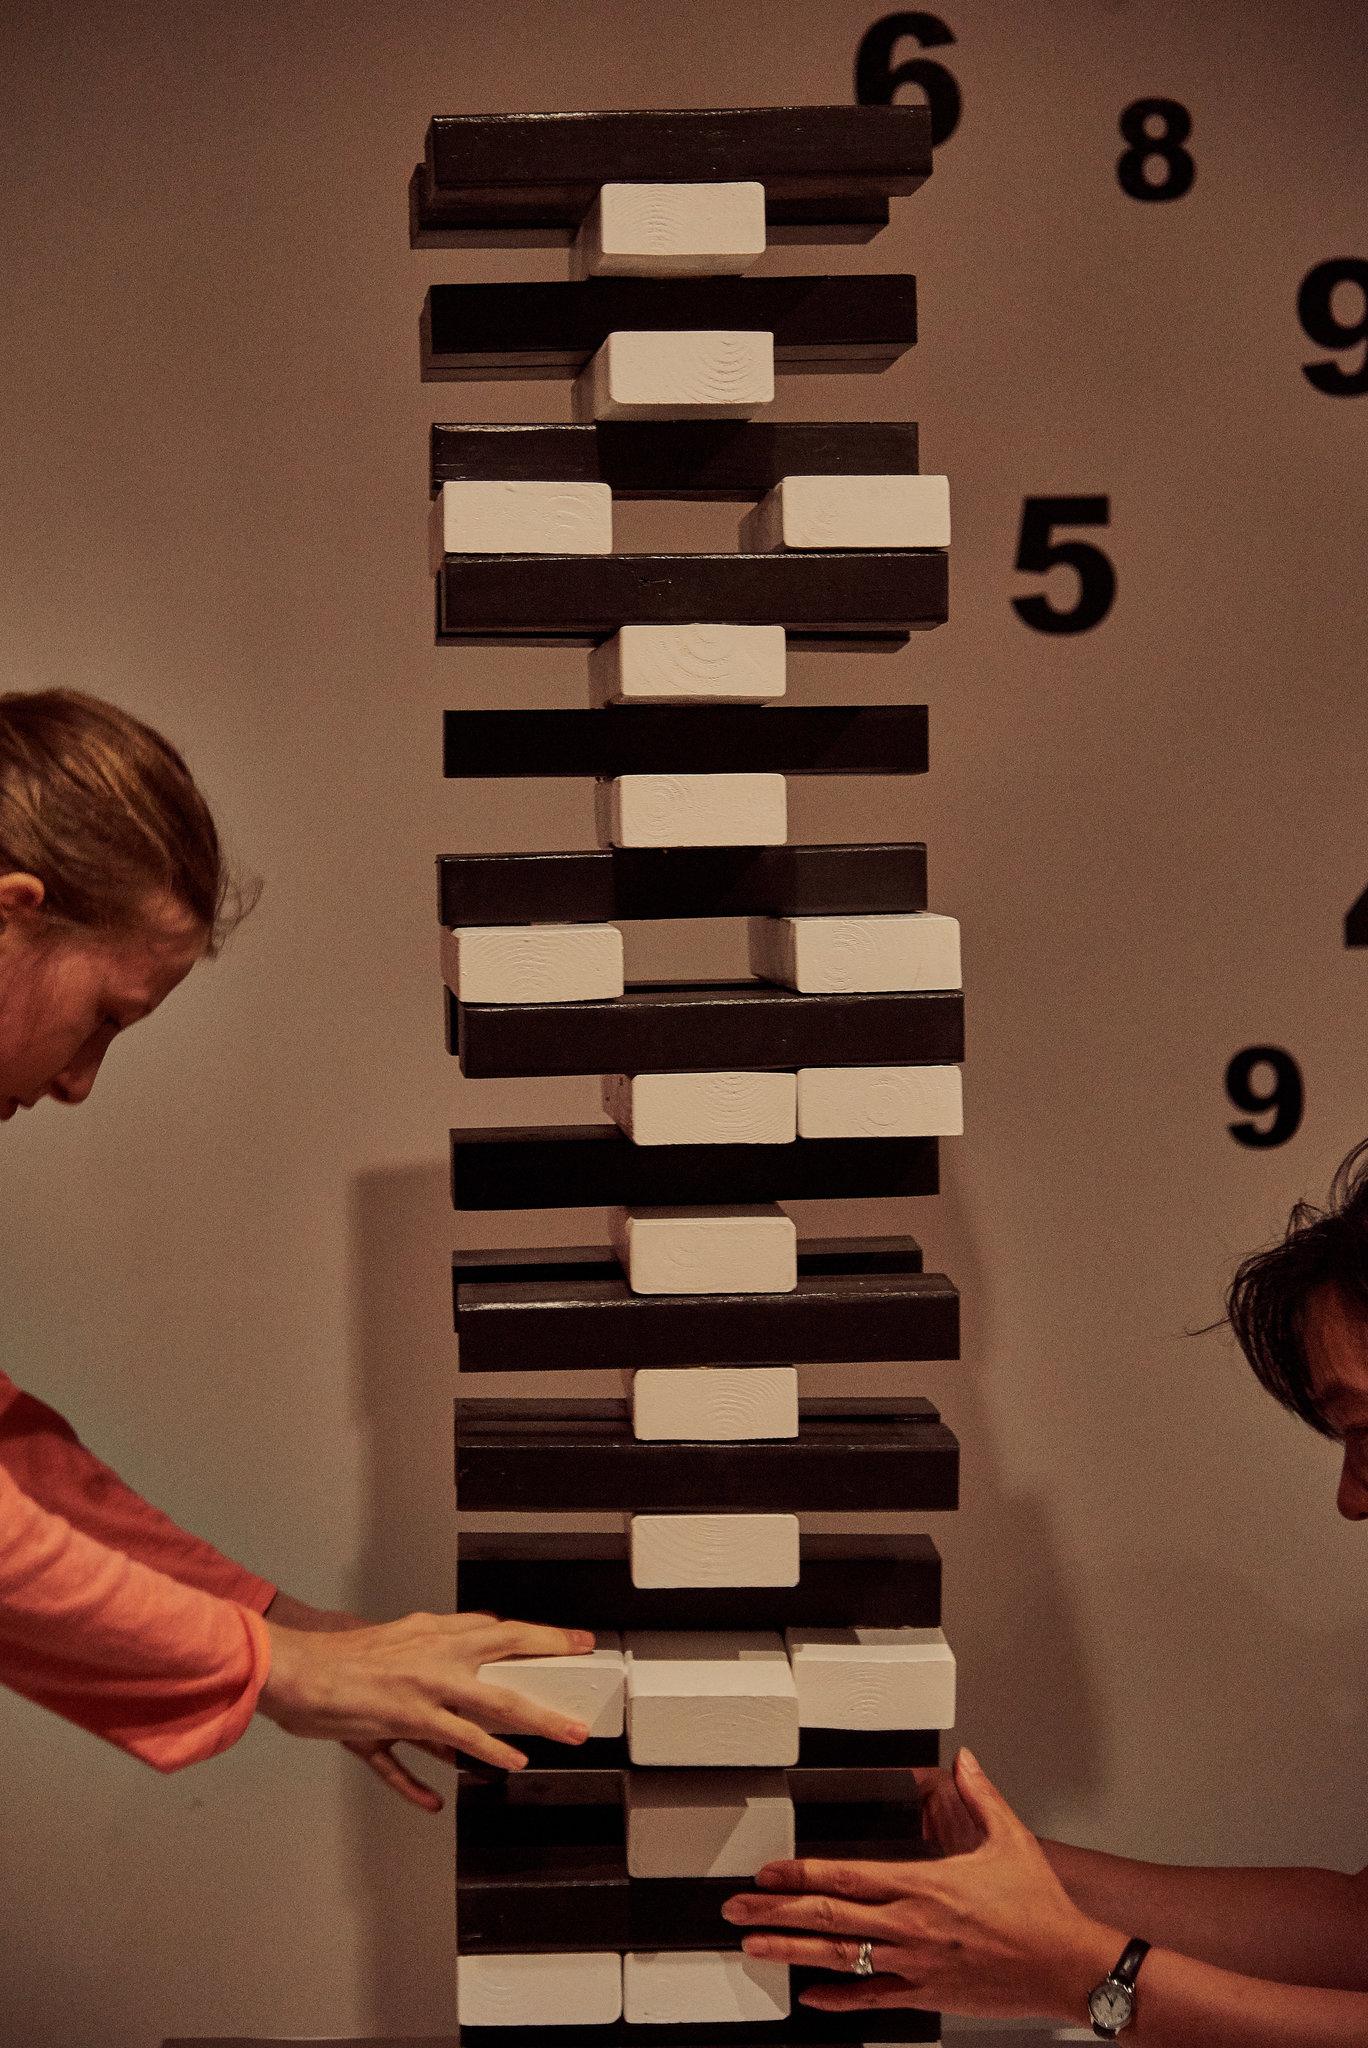 Risa Puno,  The Privilege of Escape  (installation), 2019. Image cc Victor Llorente for The New York Times.